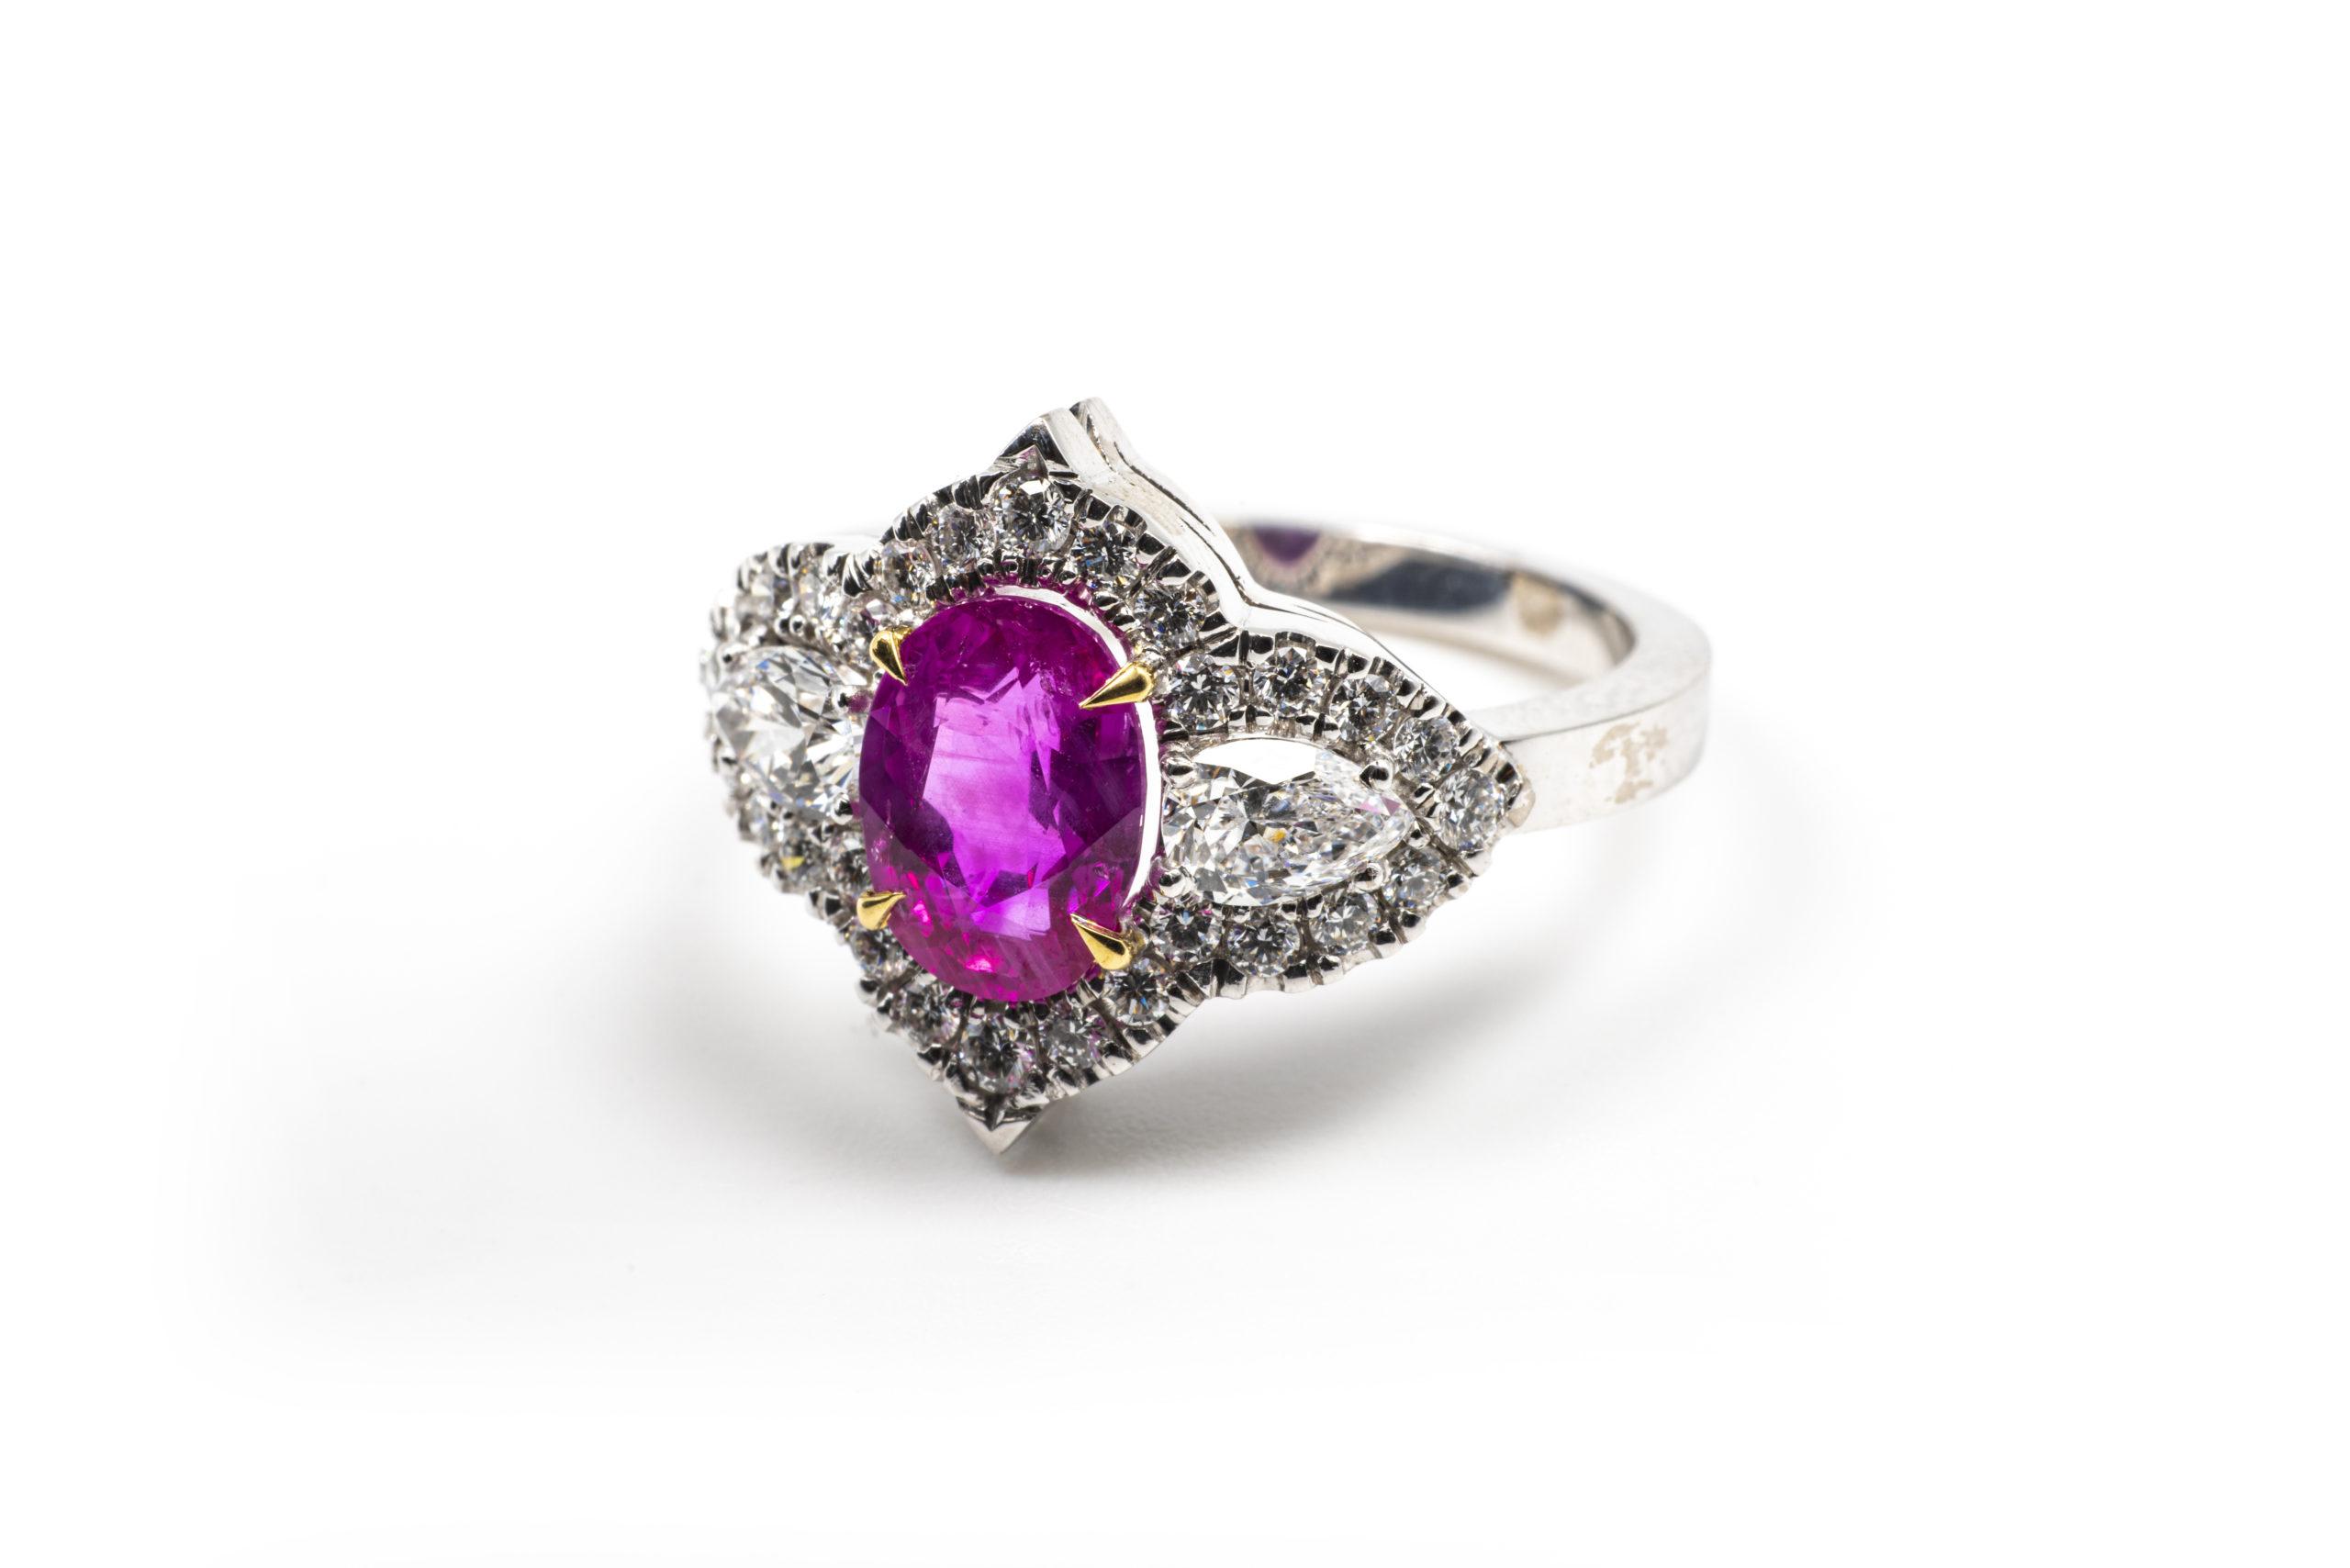 Corundum: the mineral of the precious king stones